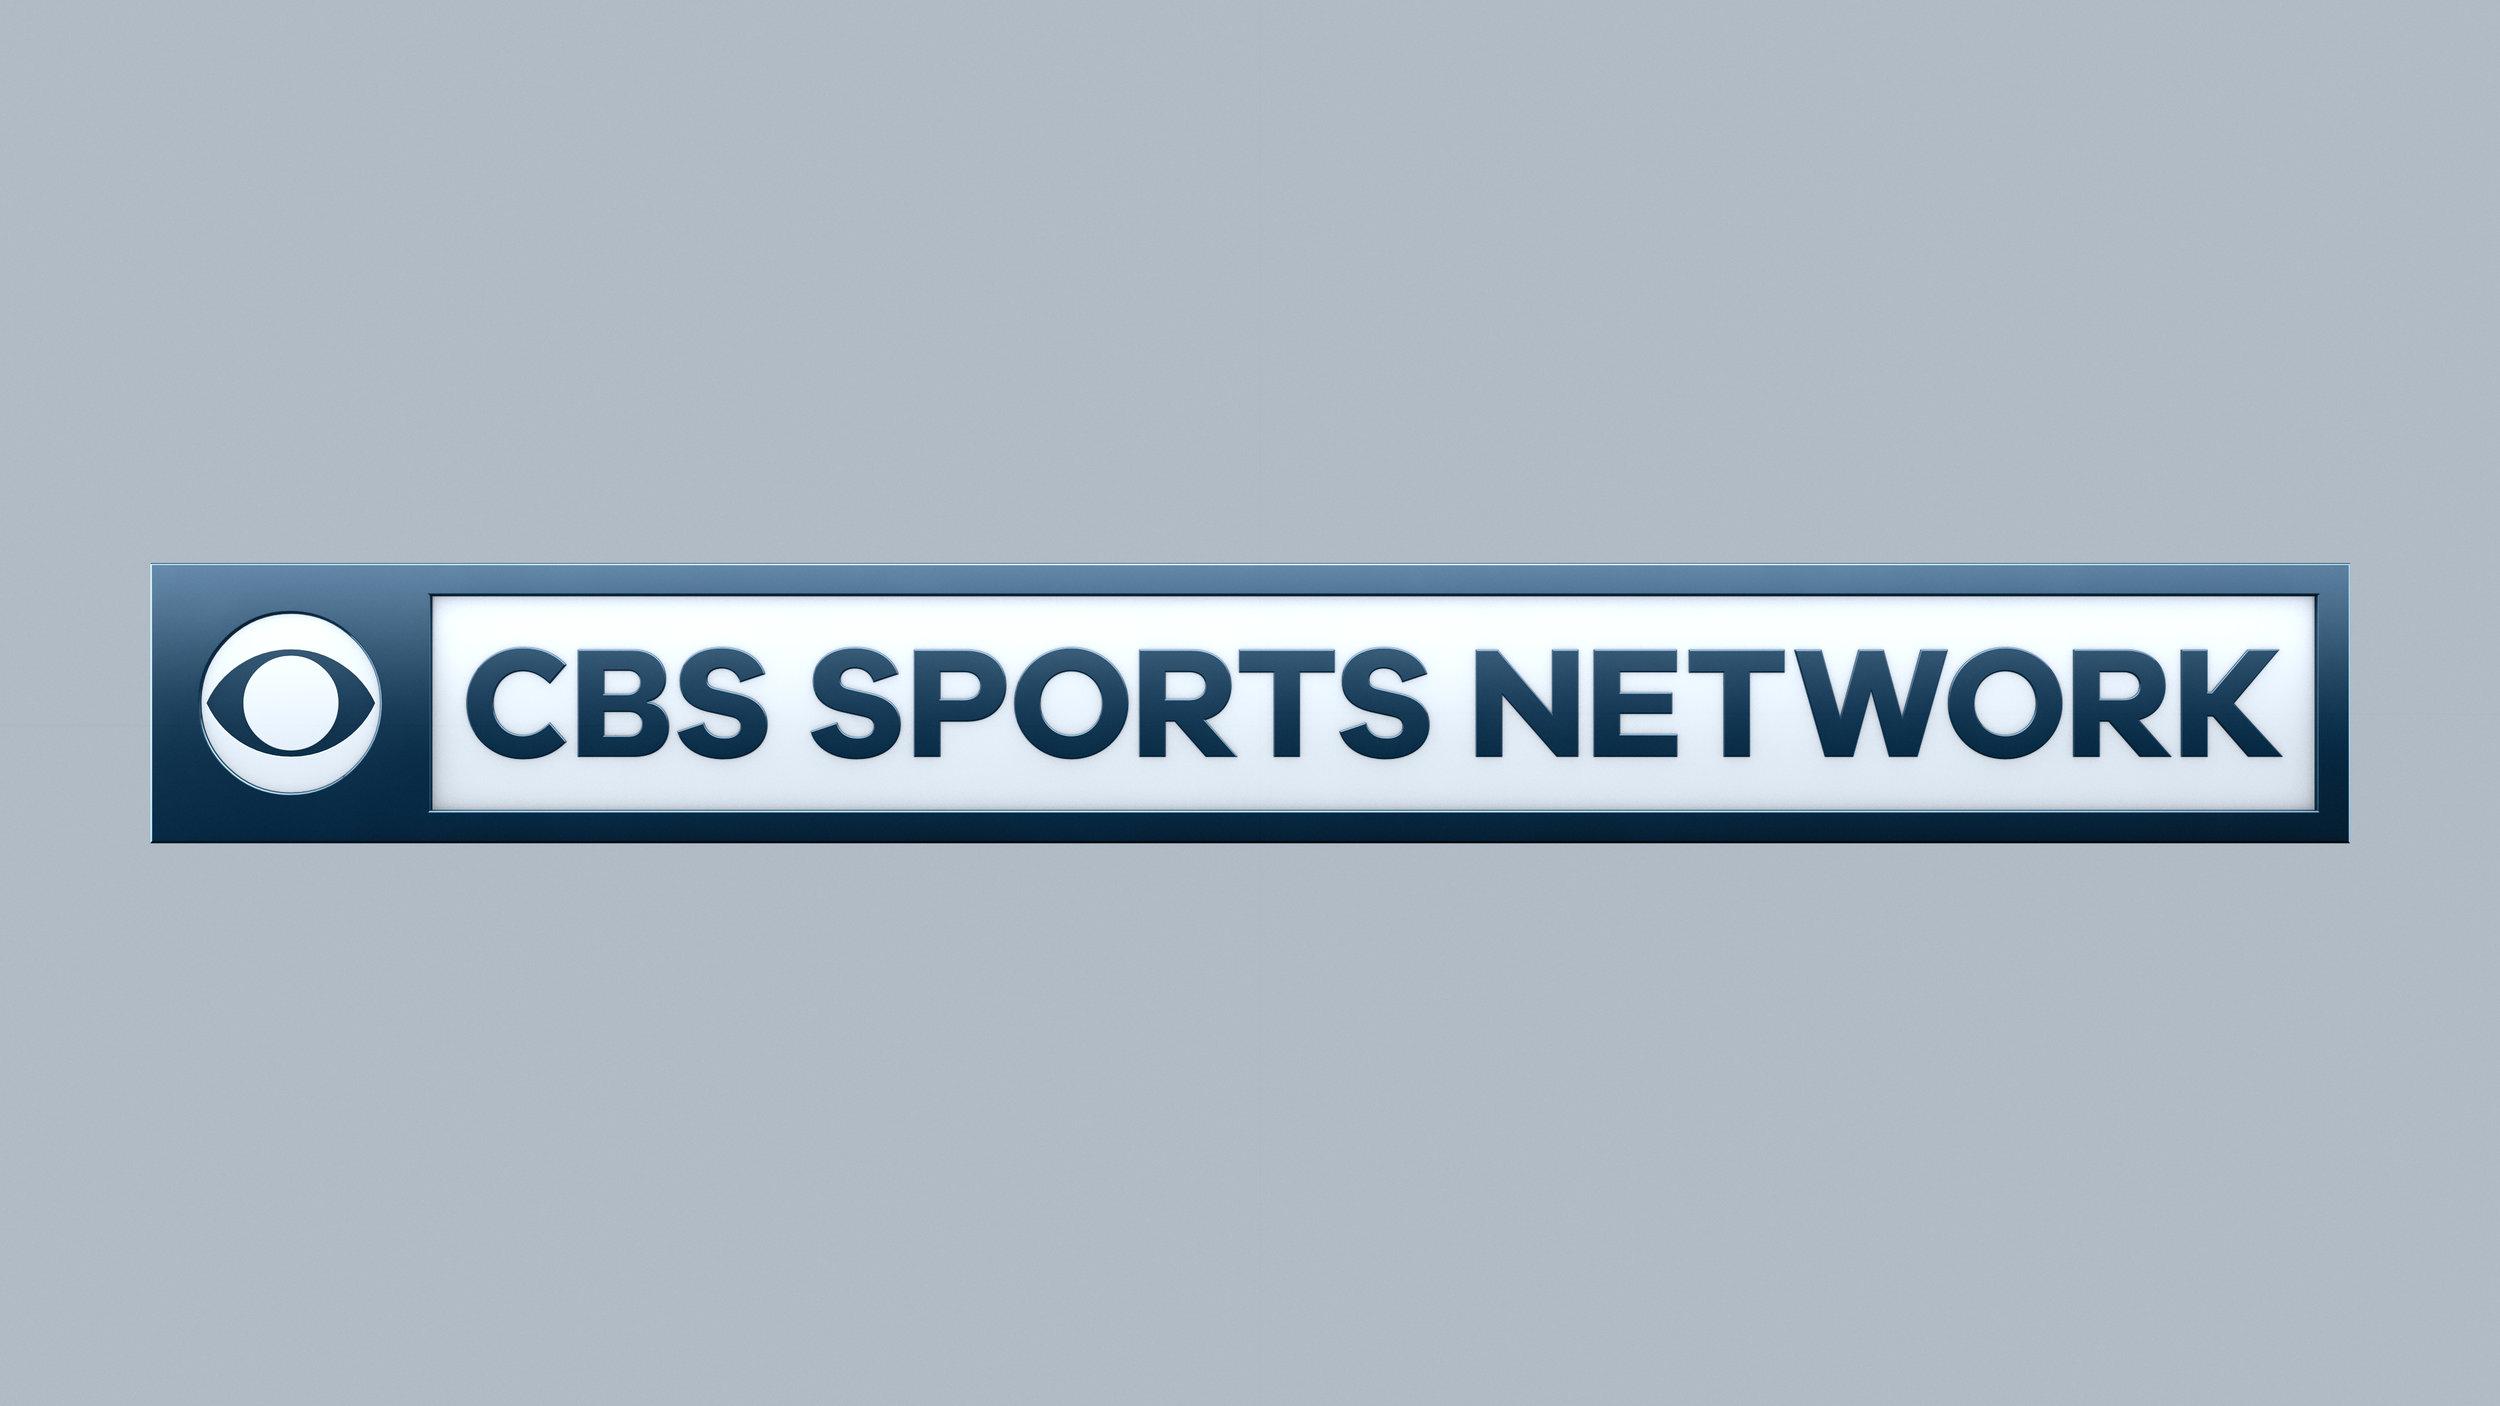 CBS_Sports_Network_Primary_v01b.jpg